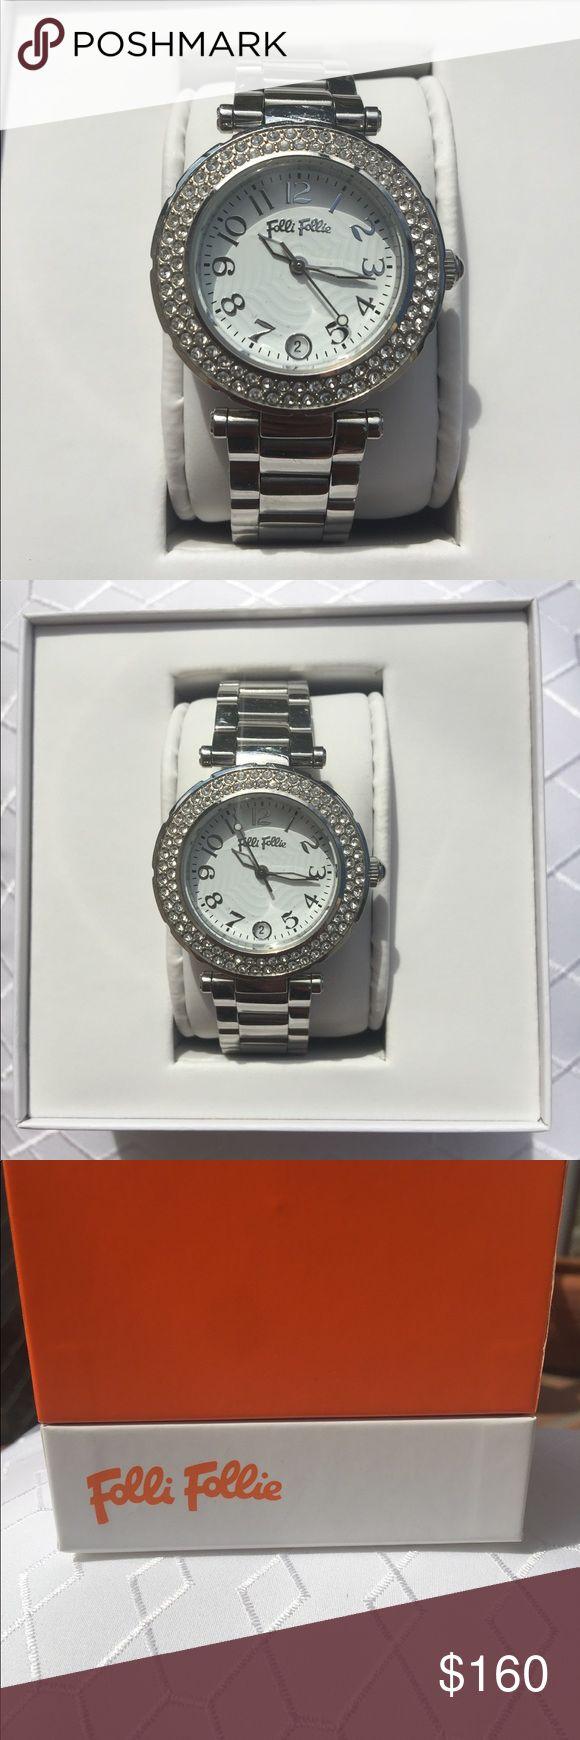 Folli Follie ladies watch🕓🕓Model WF1A022BDS ⬆️Pre-owned  ⬆️Stainless Steel⬆️Quartz (Battery)⬆️Silver⬆️Analog⬆️30.5mm⬆️Round⬆️ Bracelet/link Band⬆️ folli Follie Accessories Watches